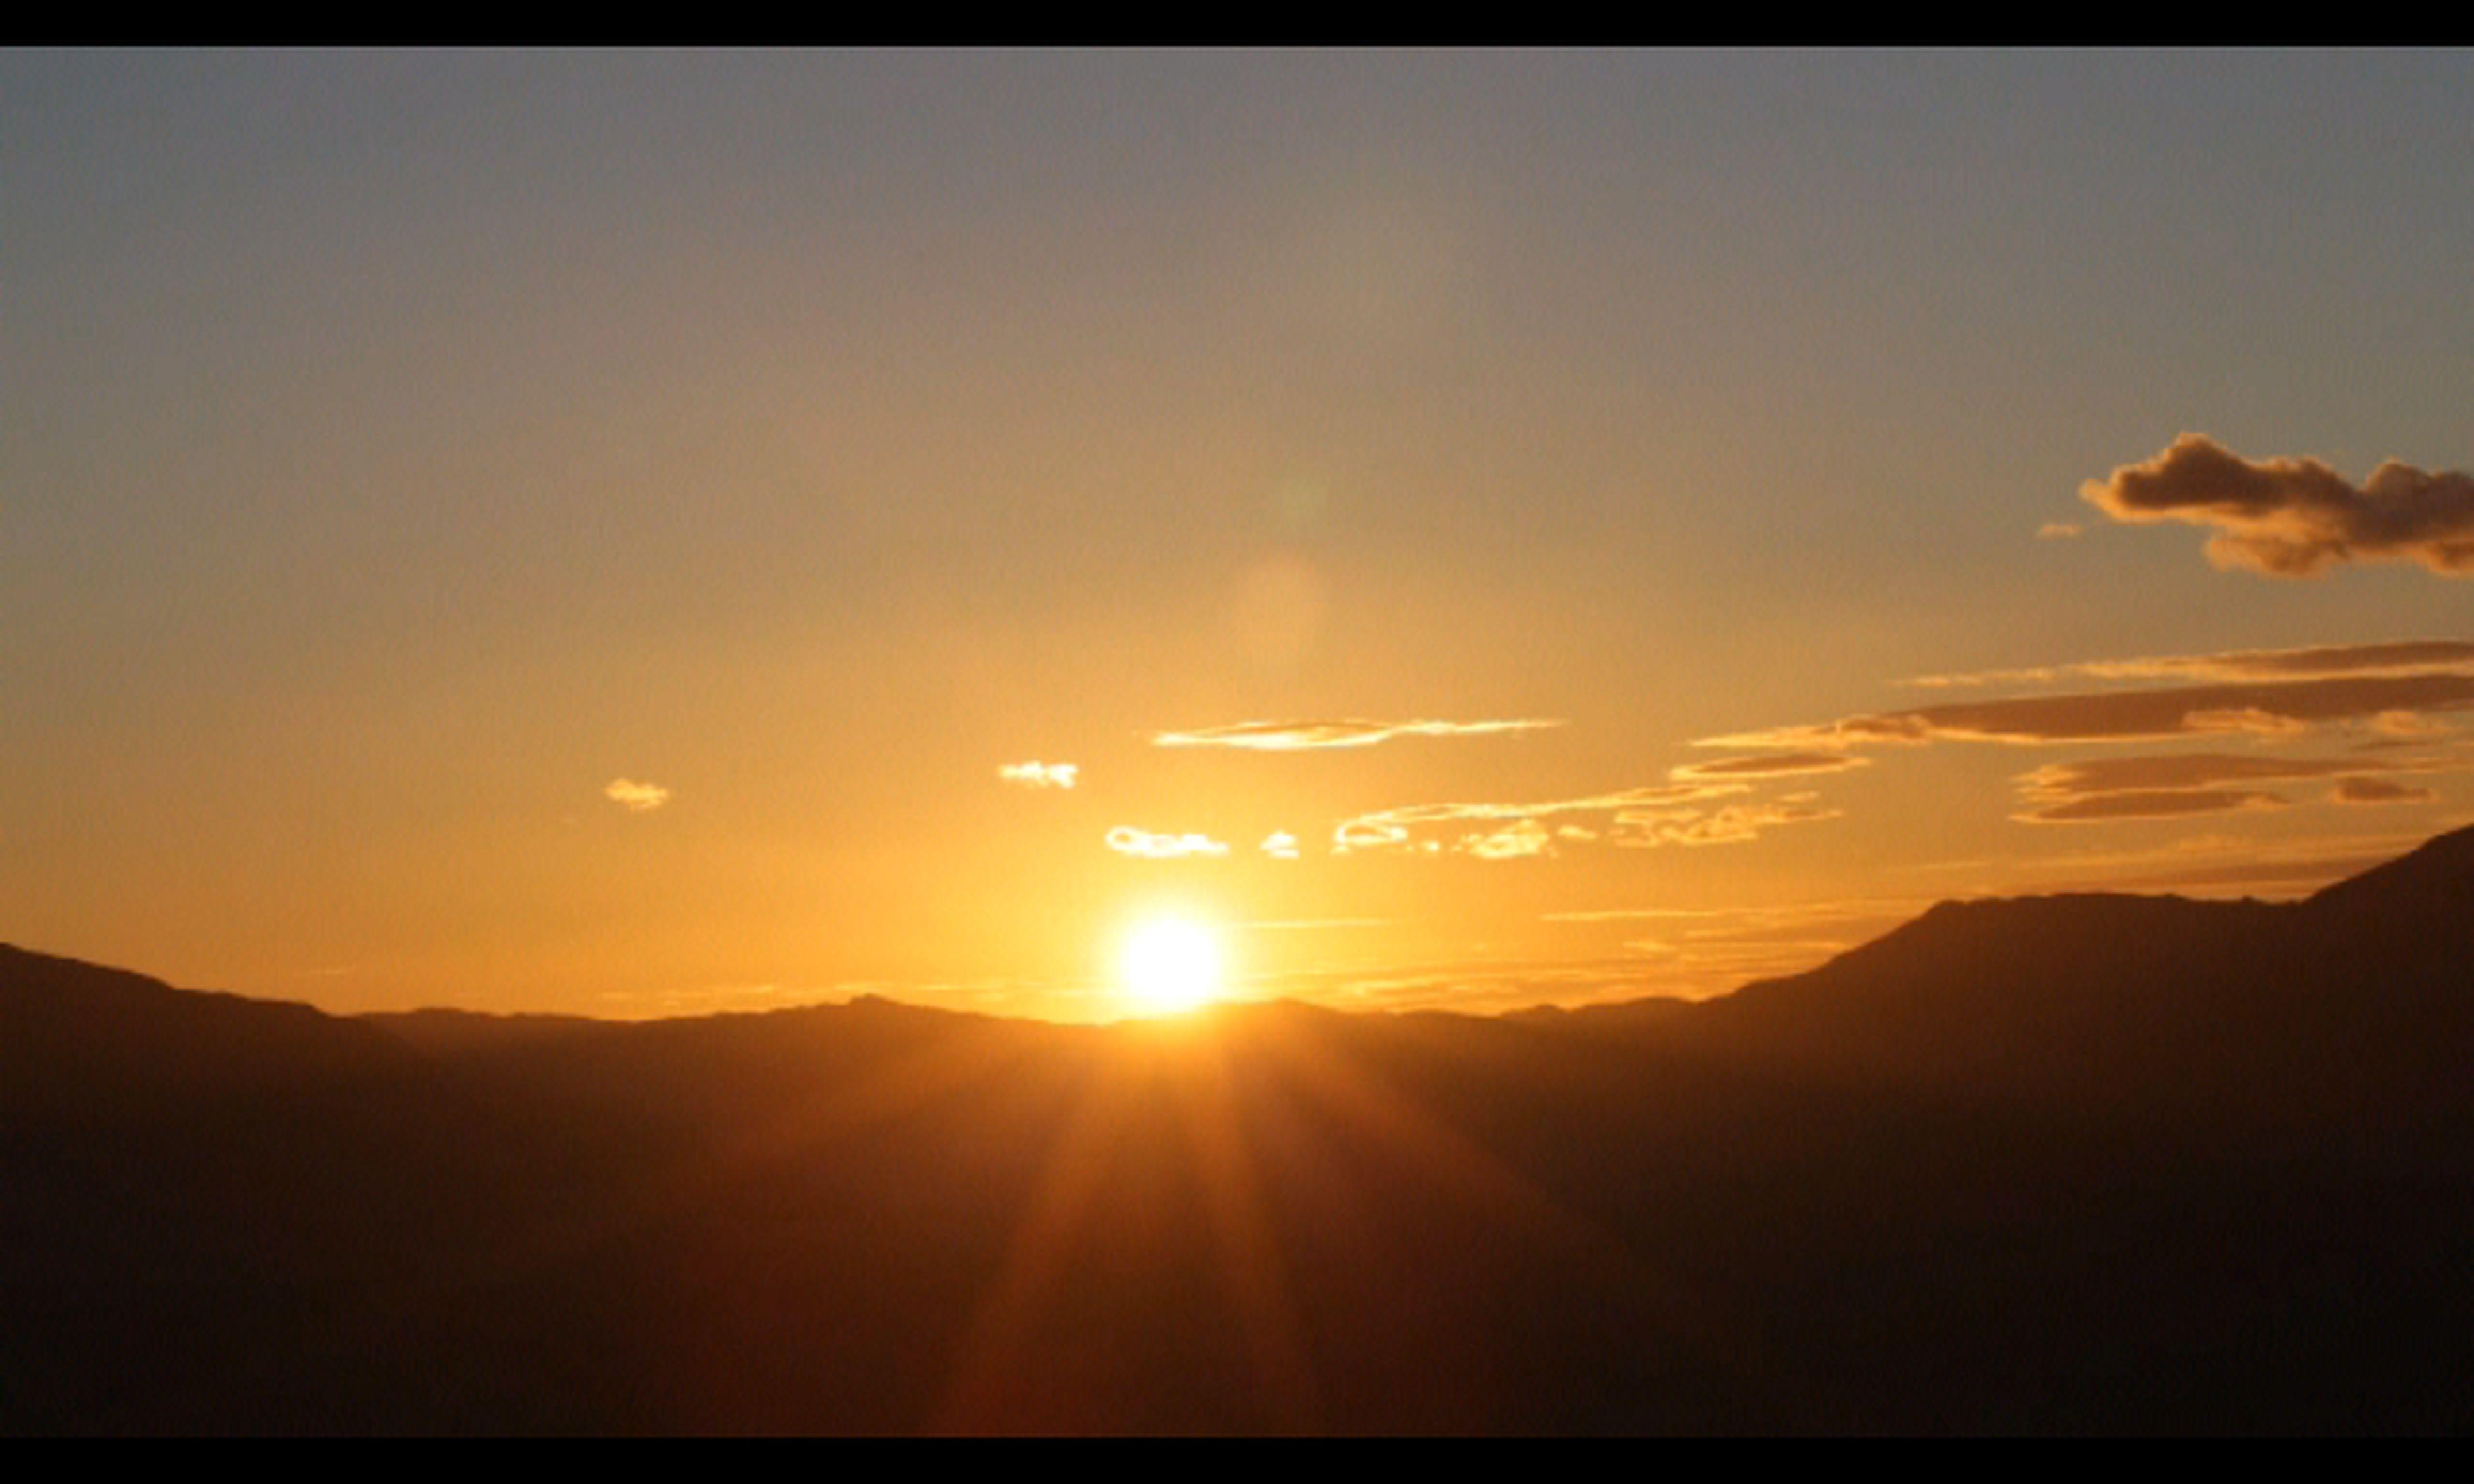 sun, sunset, scenics, tranquil scene, mountain, tranquility, beauty in nature, silhouette, sky, sunbeam, sunlight, mountain range, landscape, nature, idyllic, lens flare, orange color, cloud, outdoors, cloud - sky